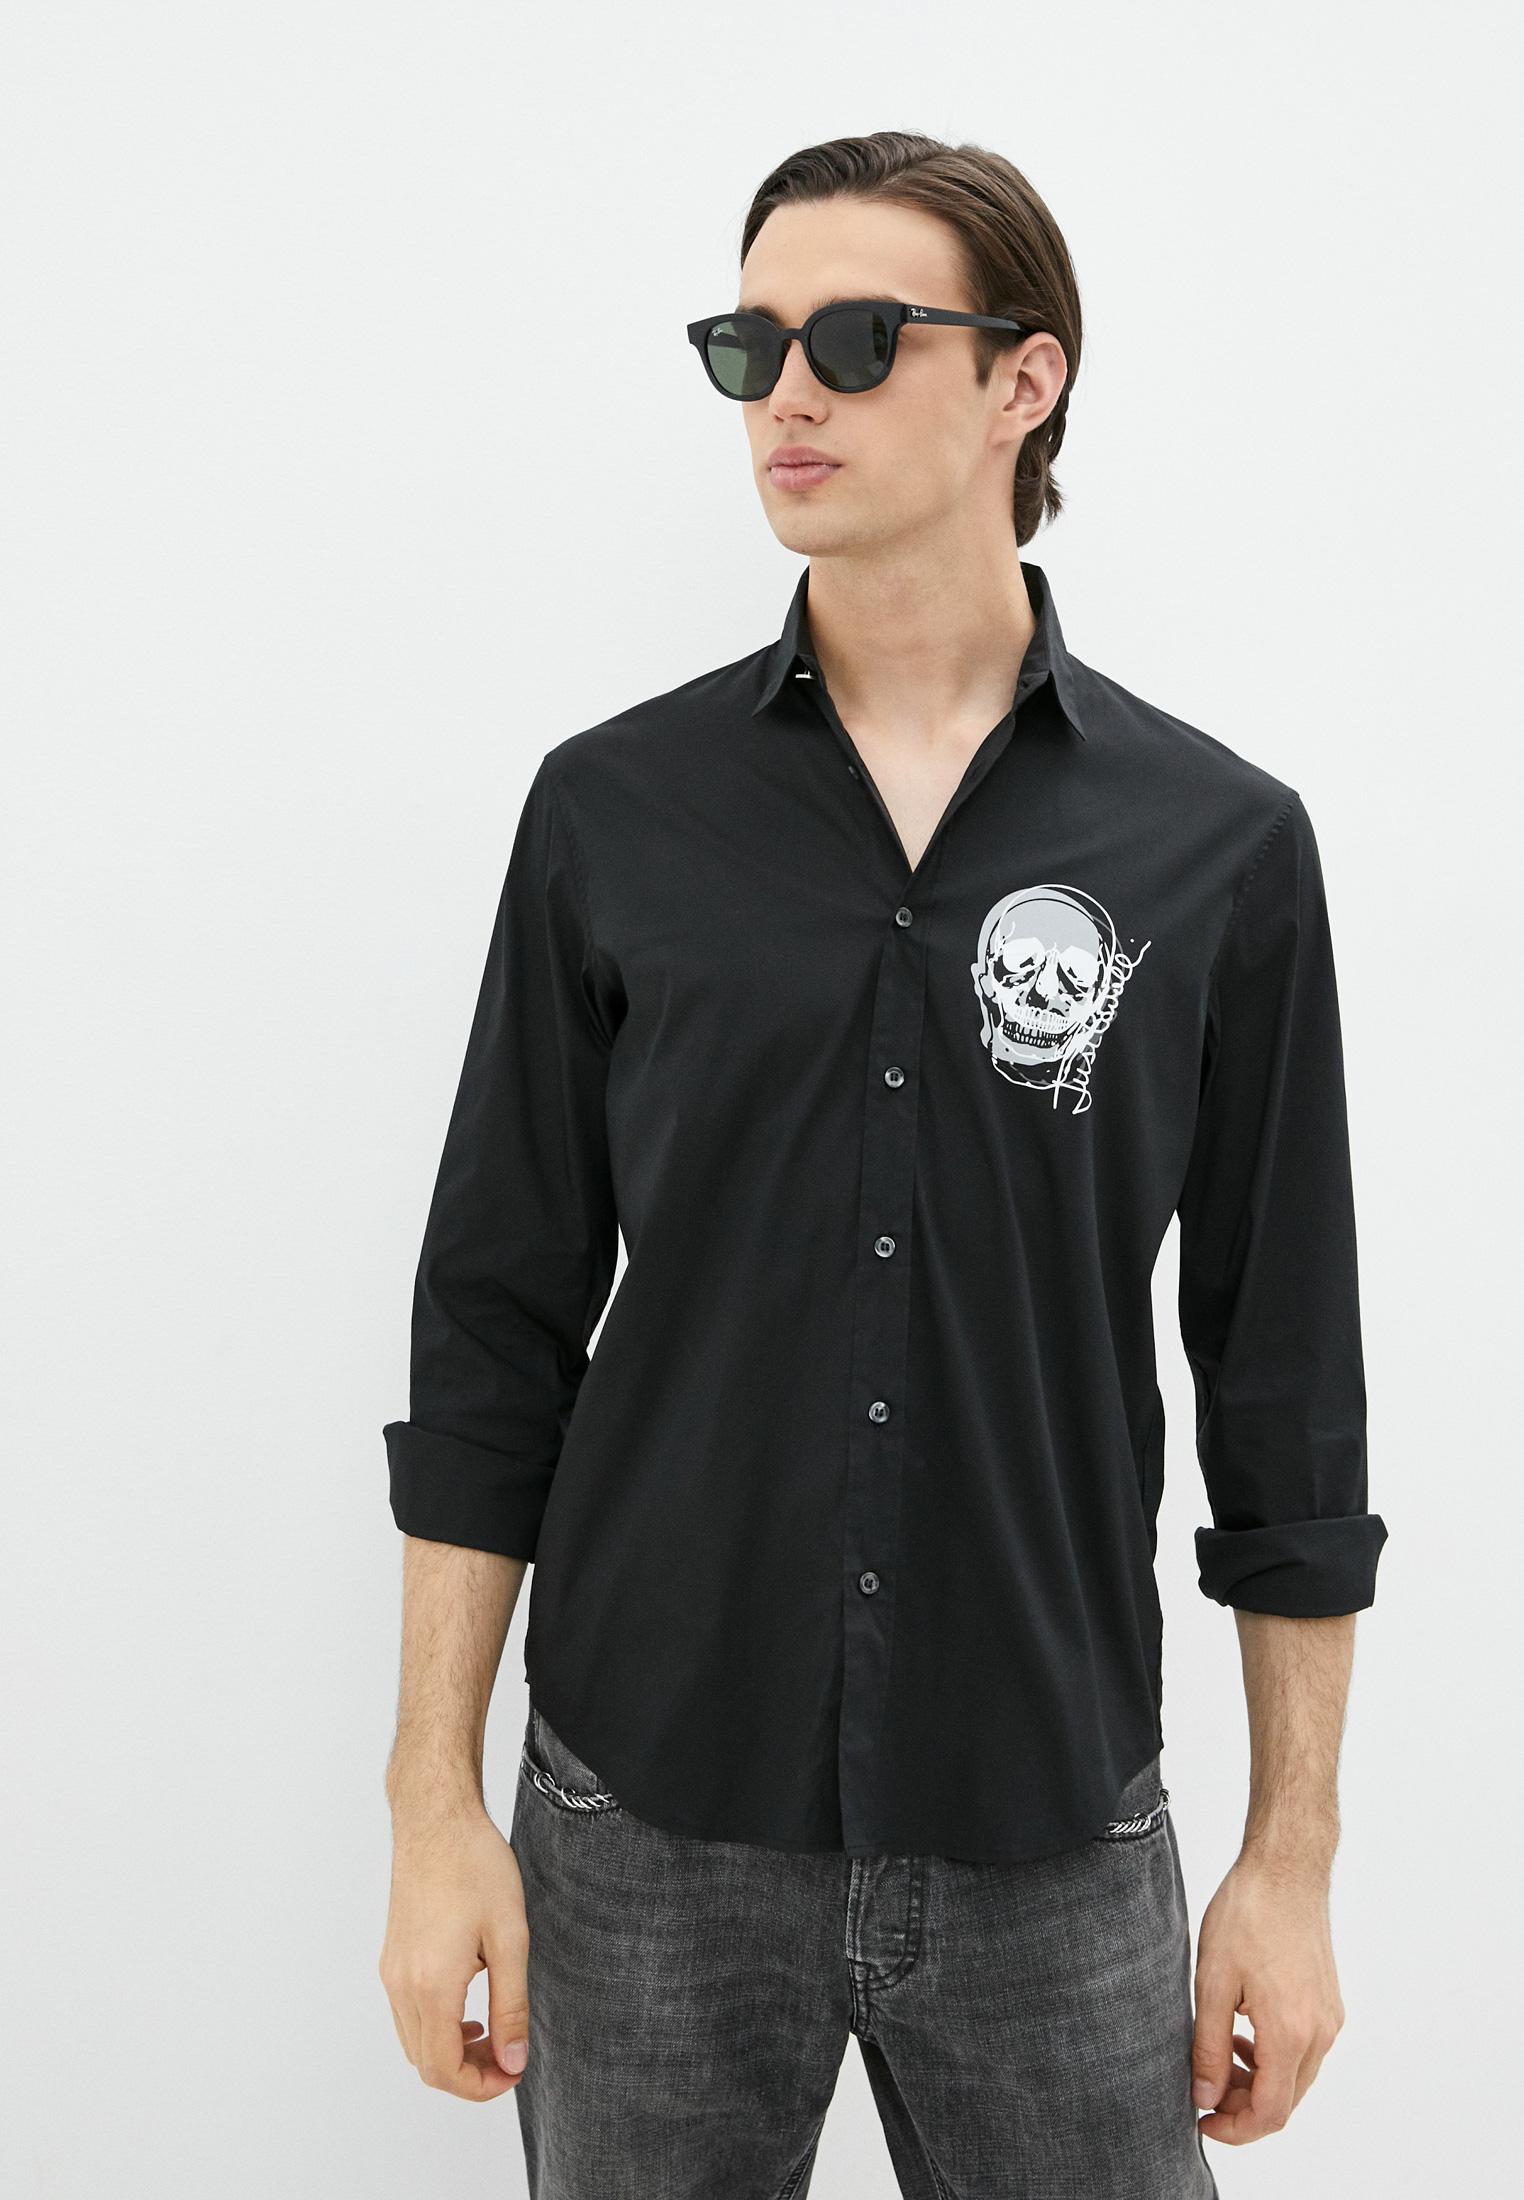 Рубашка с длинным рукавом Just Cavalli (Джаст Кавалли) S03DL0285N38909